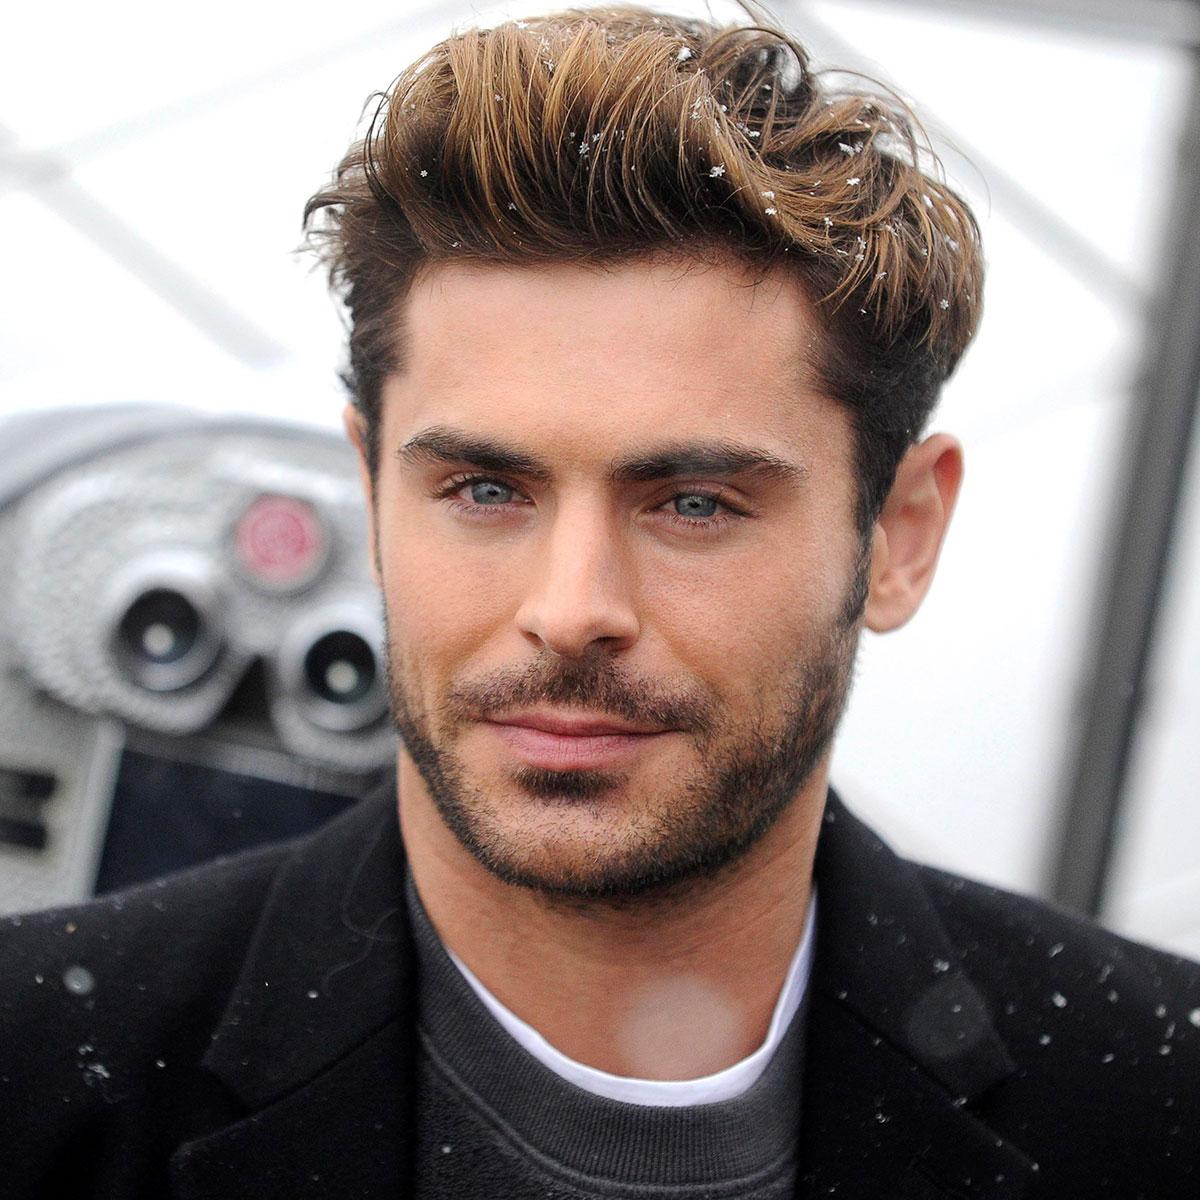 Curso de peluquería para hombre